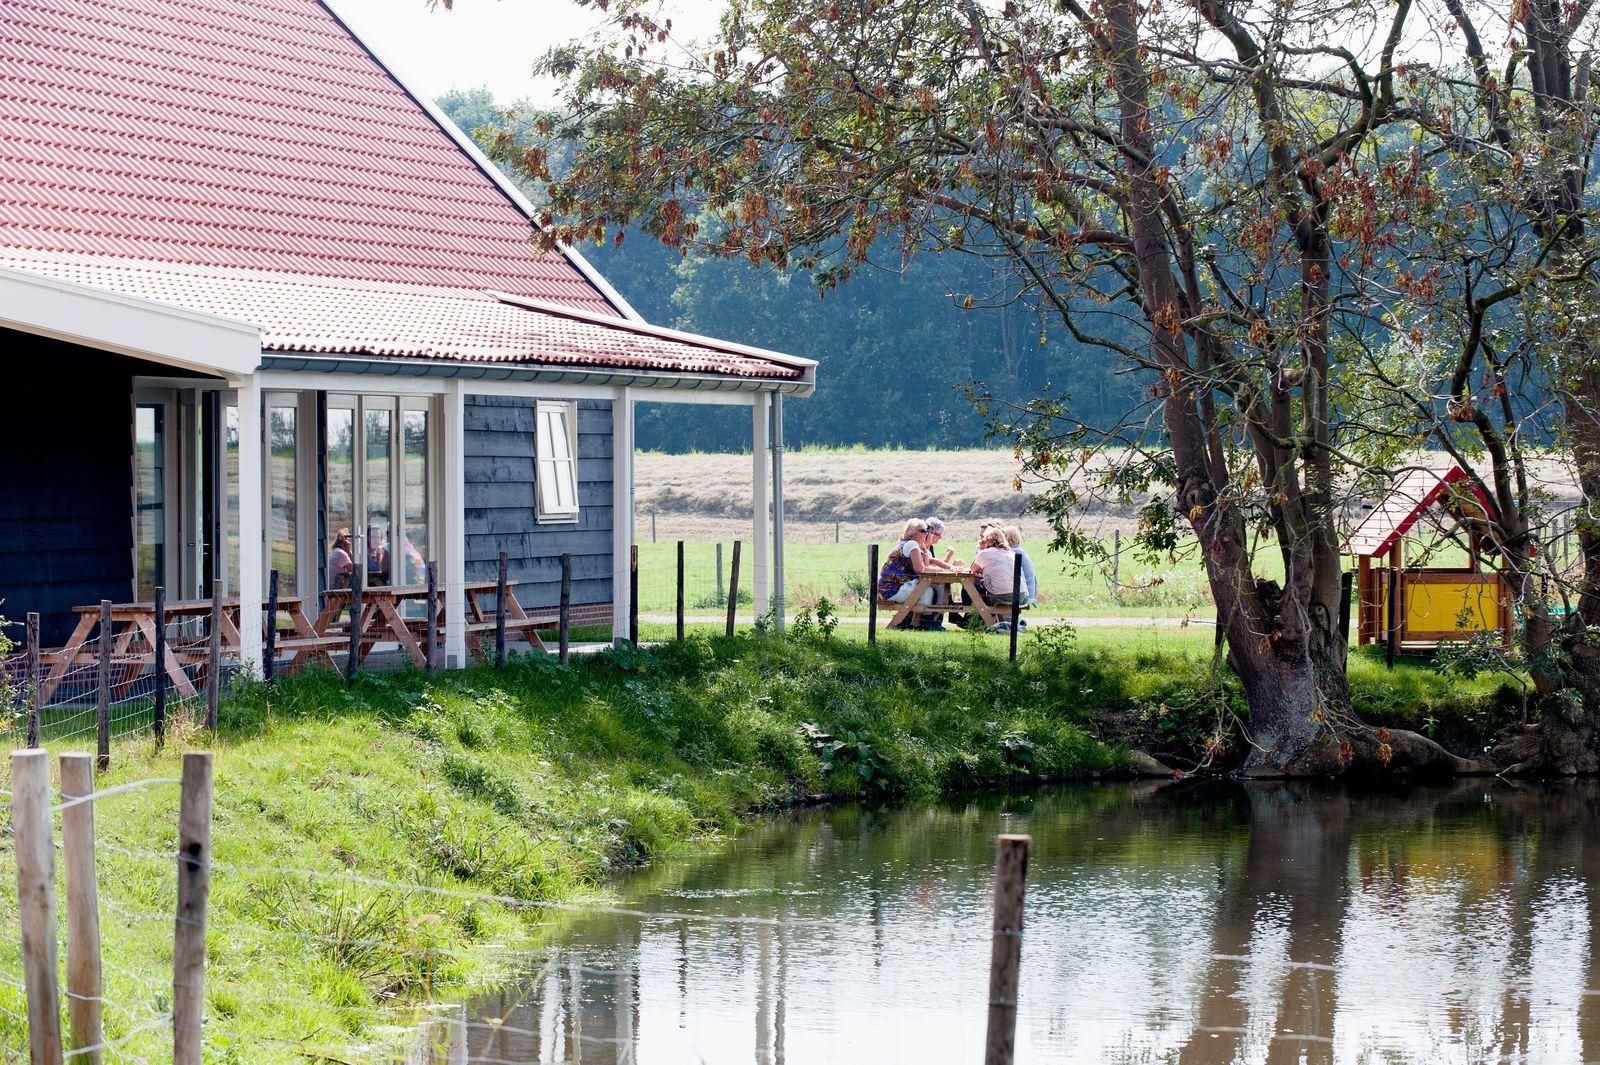 Praathuys groepsarrangement (Praathuys met Zeeuwse Cottages)